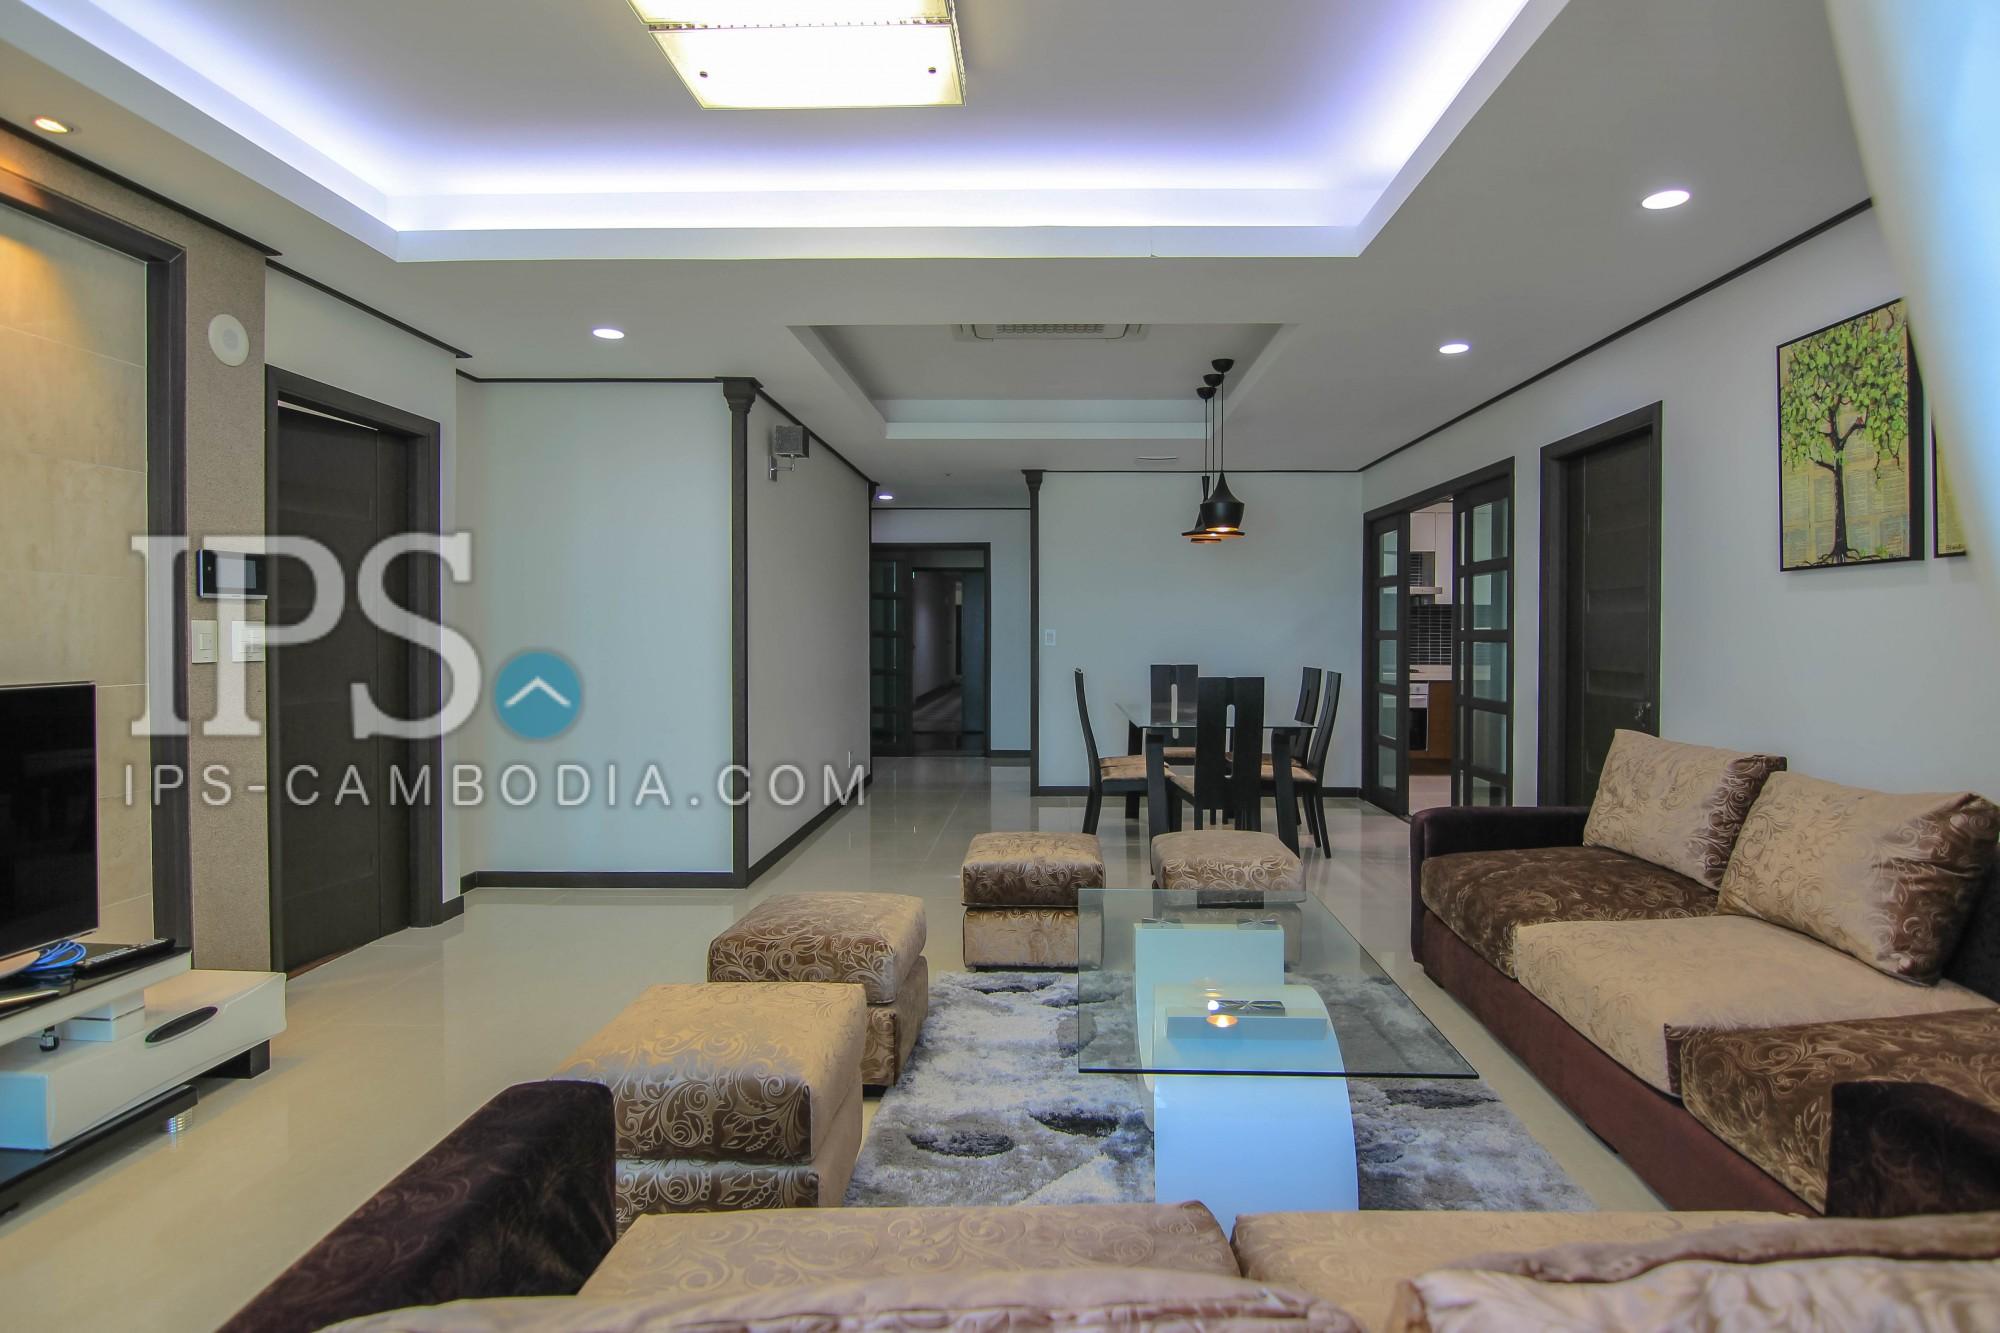 4 Bedroom Apartment/Flat For Rent - BKK1, Phnom Penh